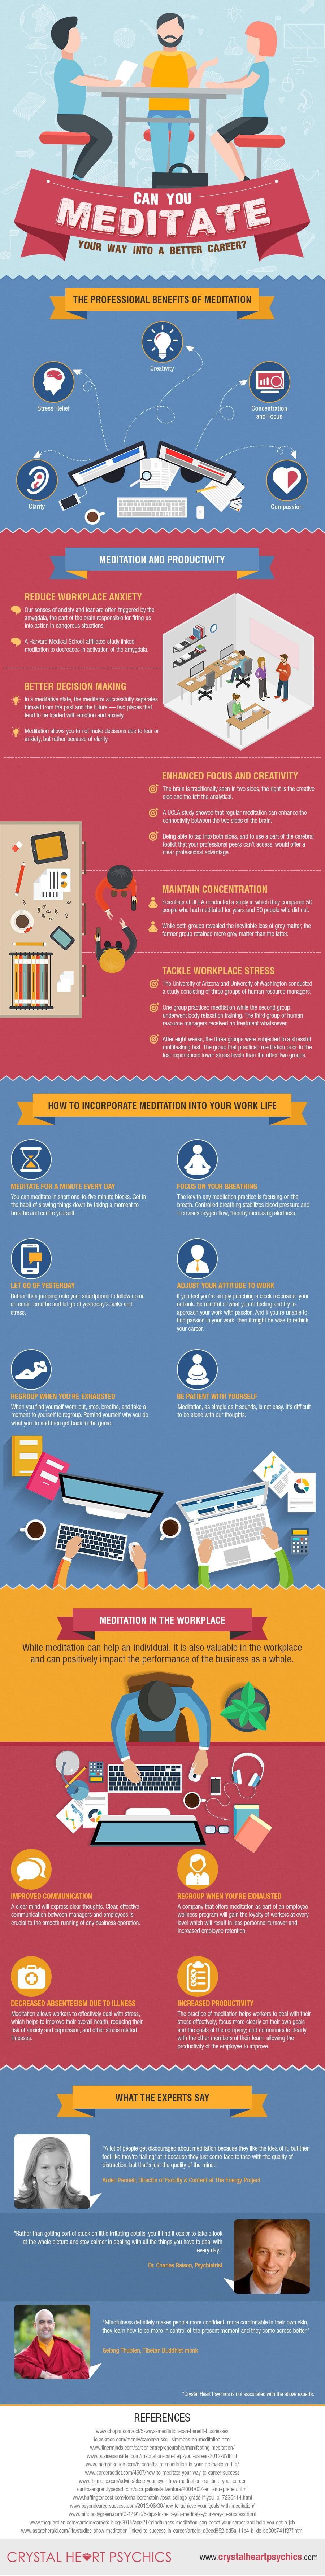 Meditation-Career-Success-Infographic (1)